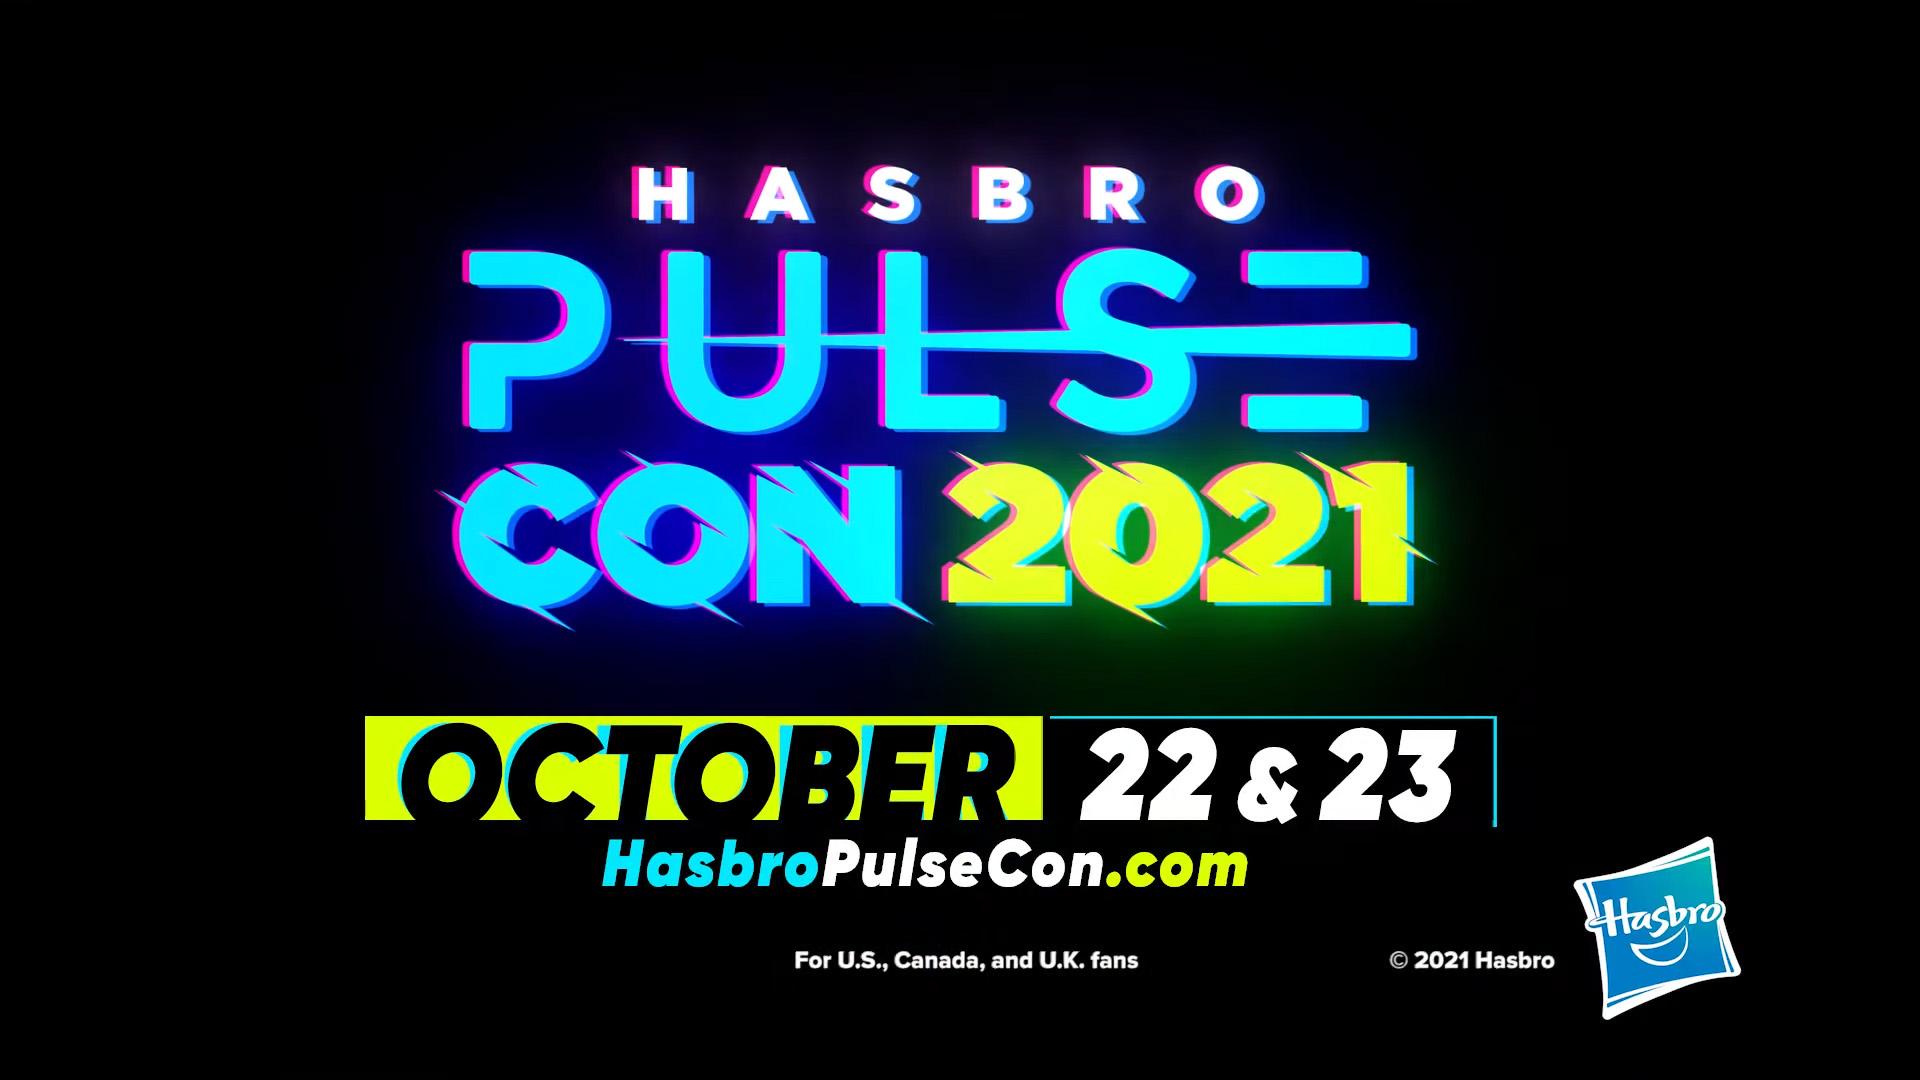 Hasbro Pulsecon 2021 Dates Announced - HissTank.com